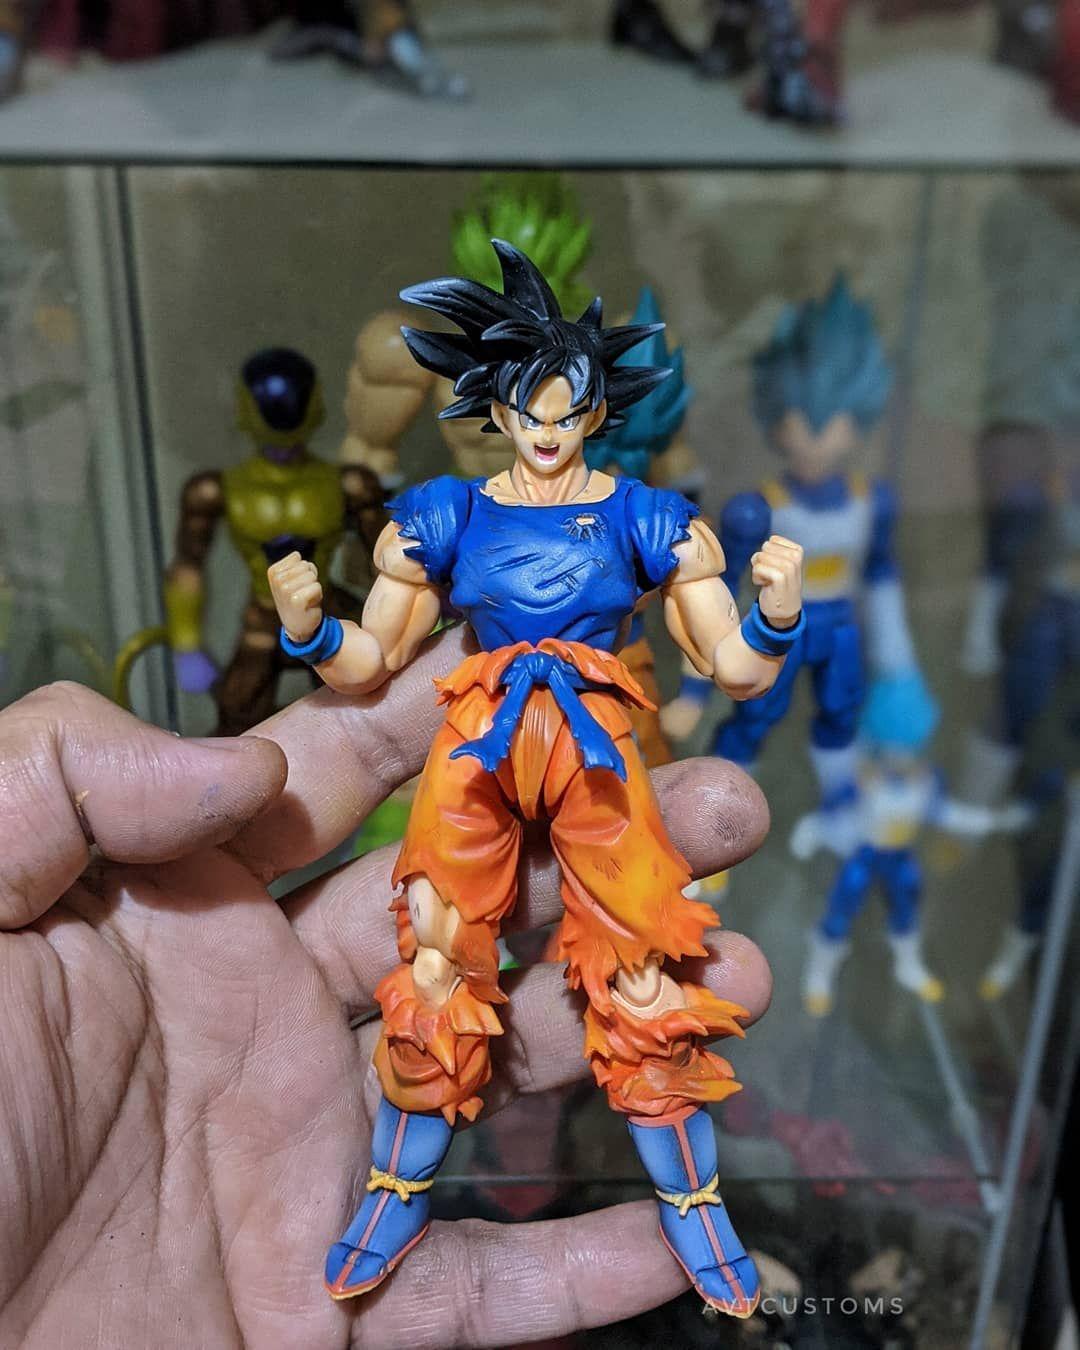 Shf Ultra Instinct Goku By Avtcustoms Goku Super Saiyan Blue Super Saiyan God